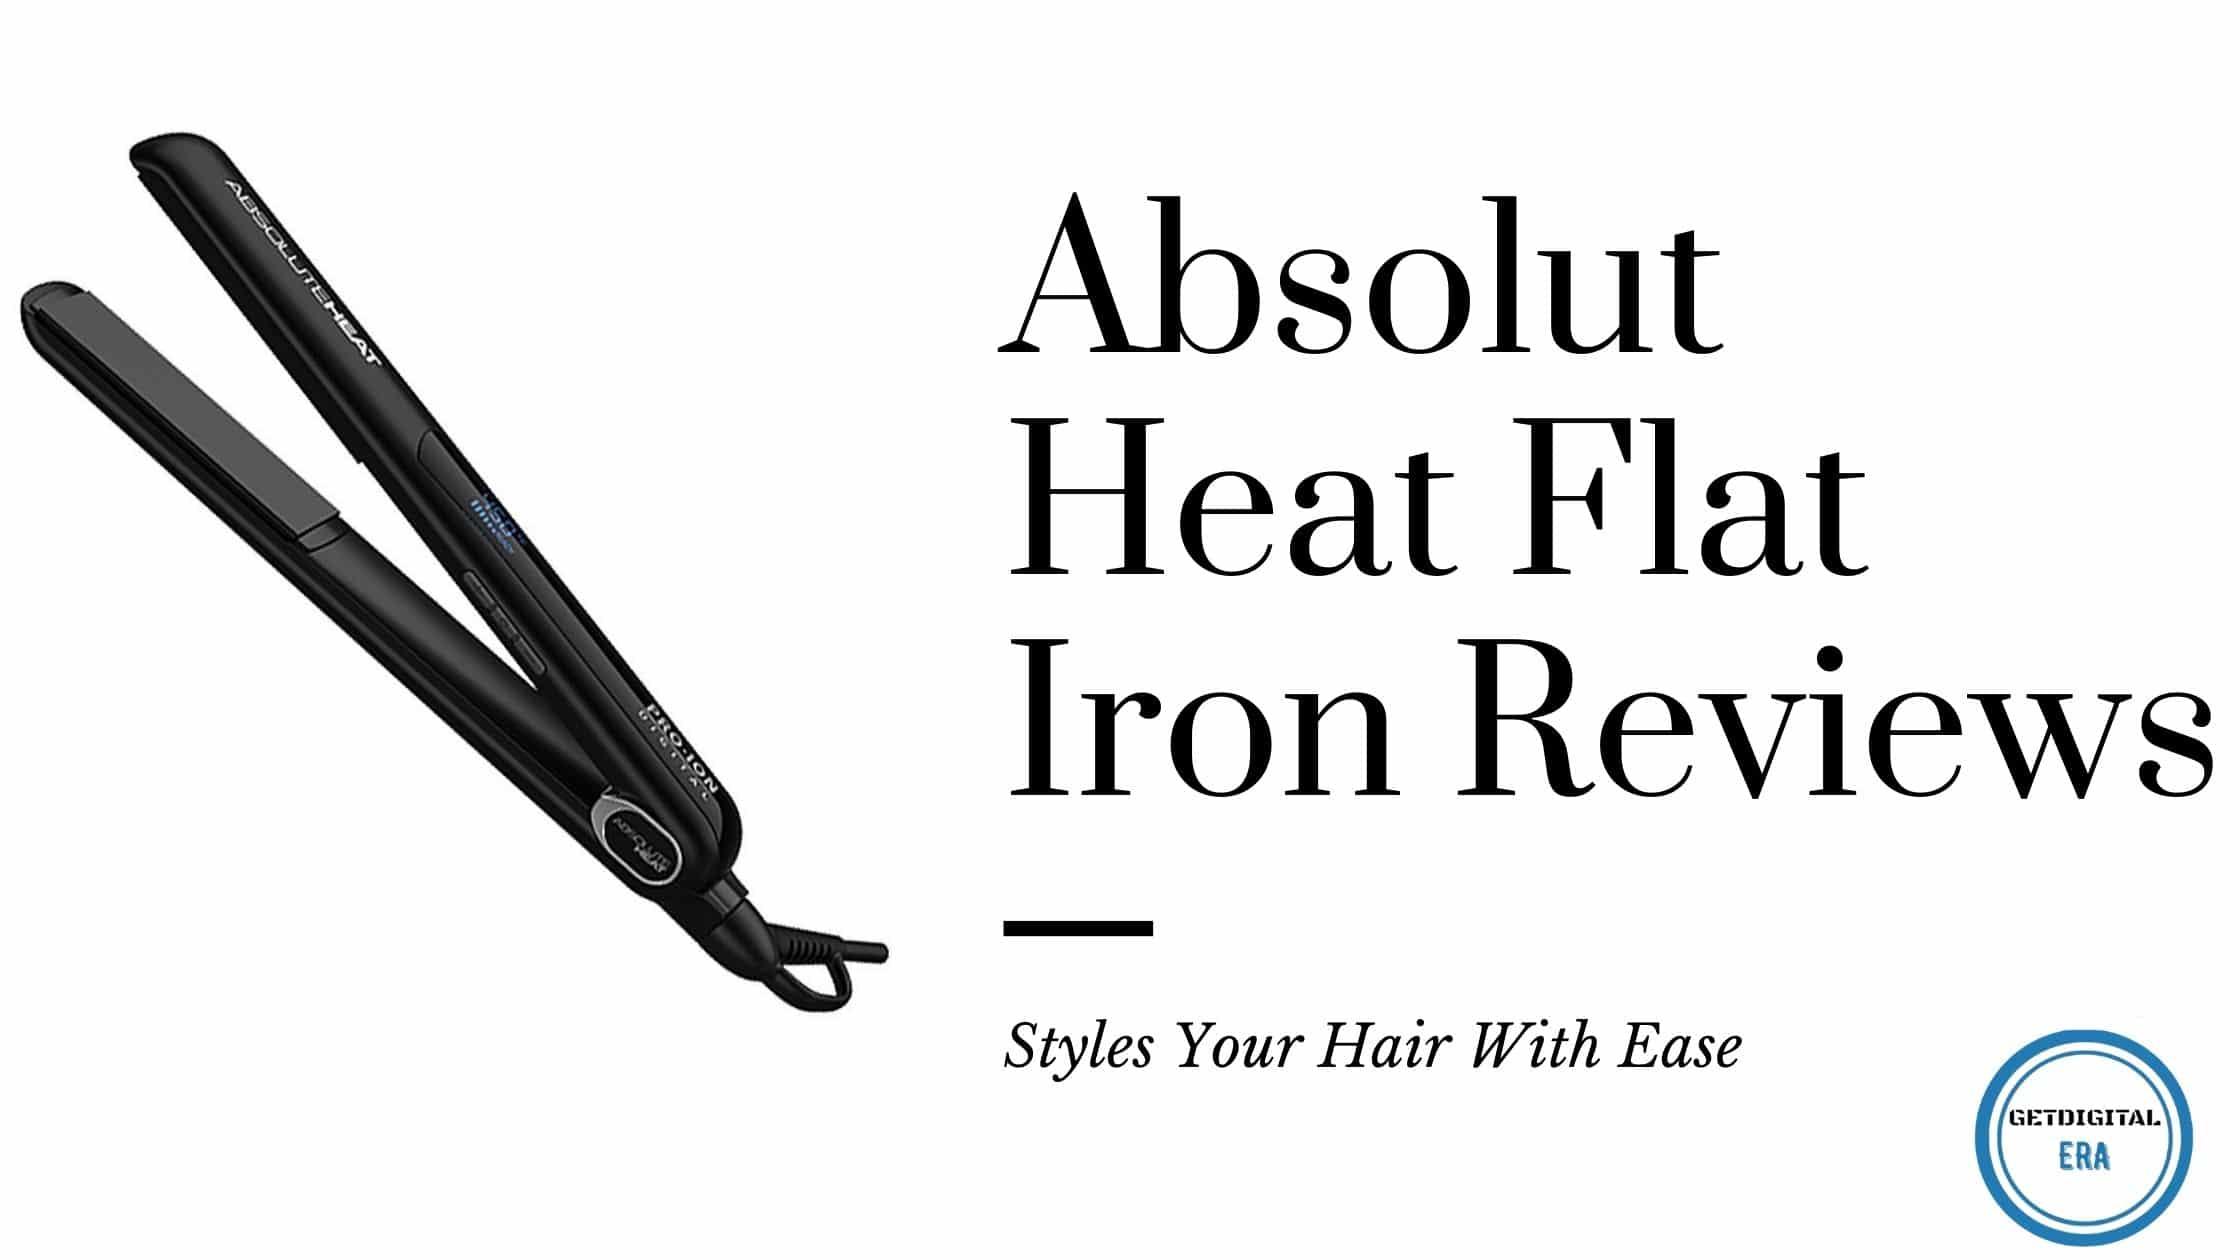 Absolute Heat Flat Iron Reviews